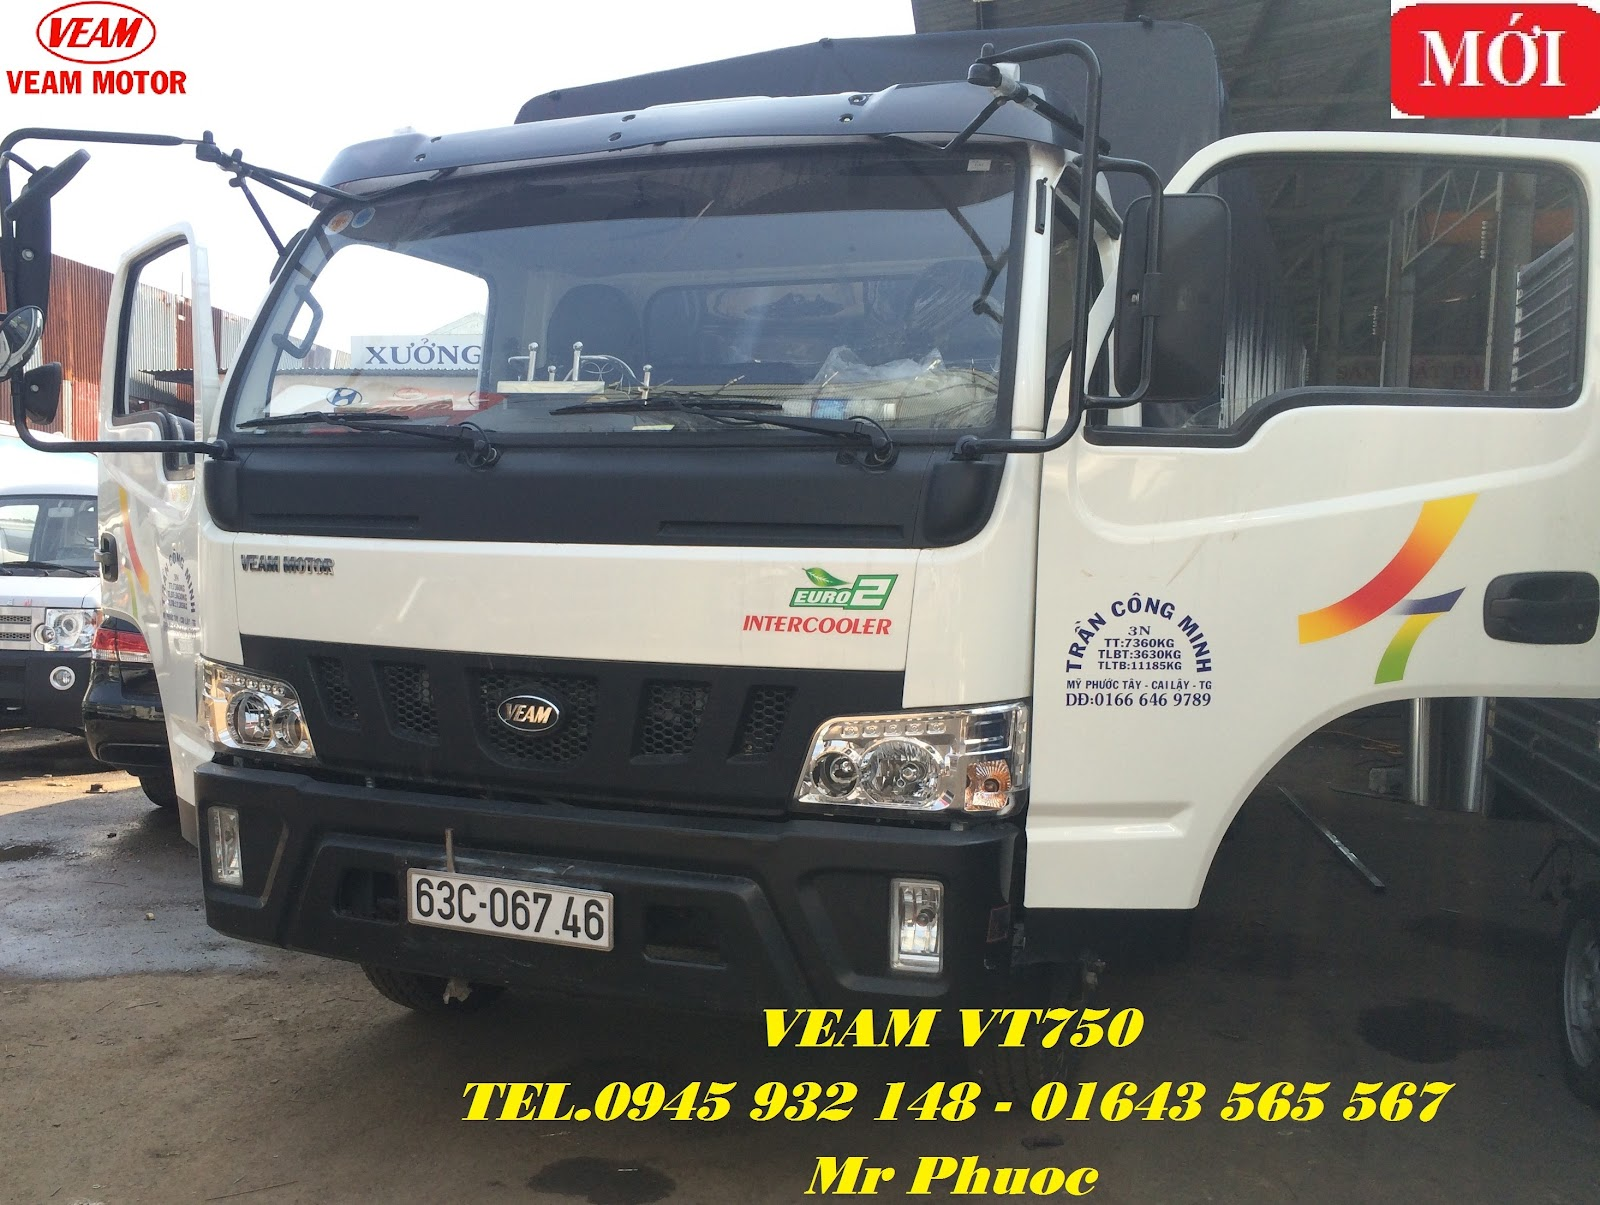 xe tai VEAM 75 tan xe VEAM VT750 75 tan xe tai VEAM 7T5 thung mui bat 2016